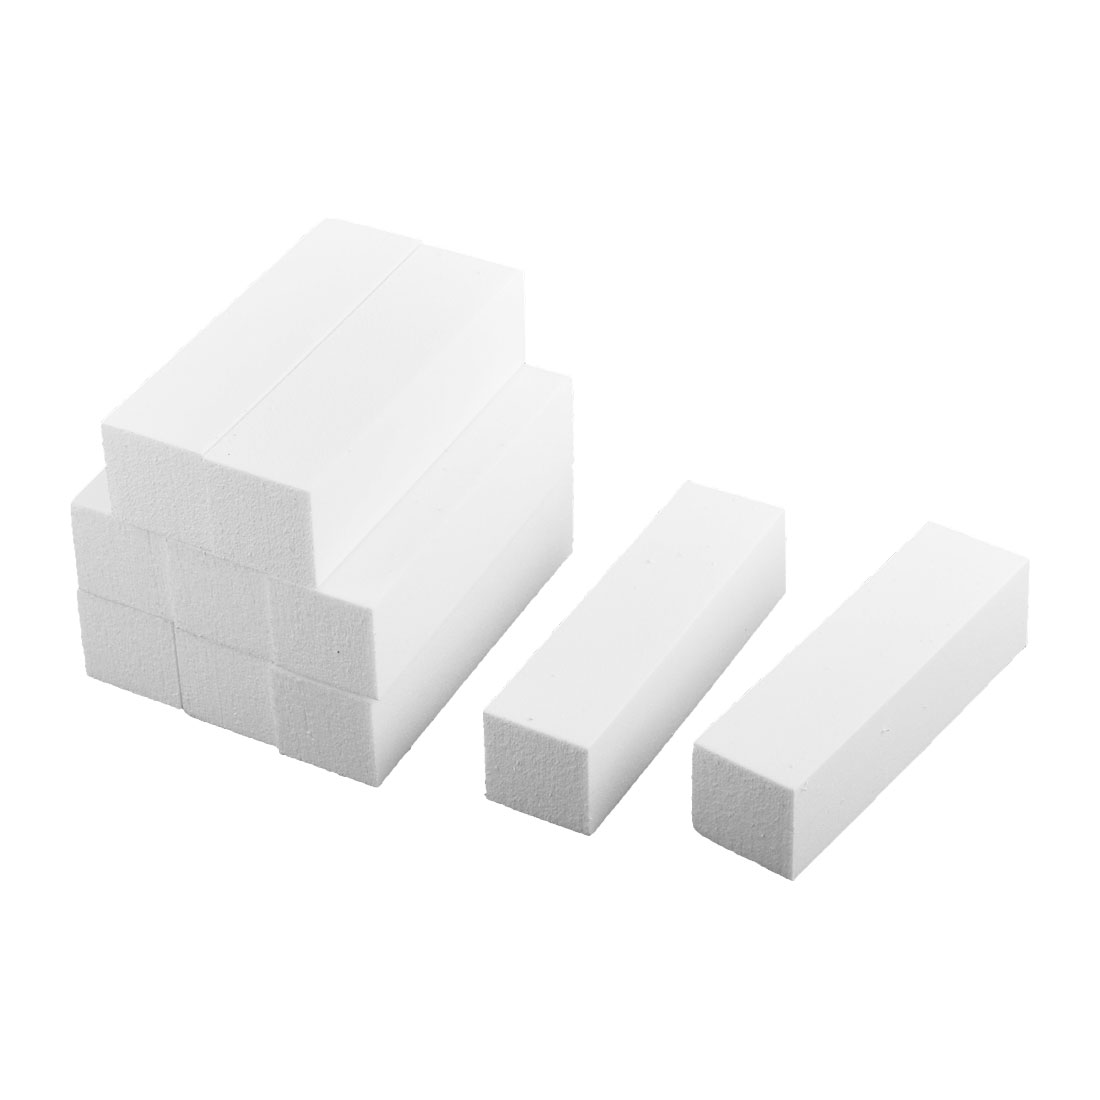 10PCS 4 Way Nail Art Care Shiner Polish Buffer Buffing Sanding Block Files Grit Tool